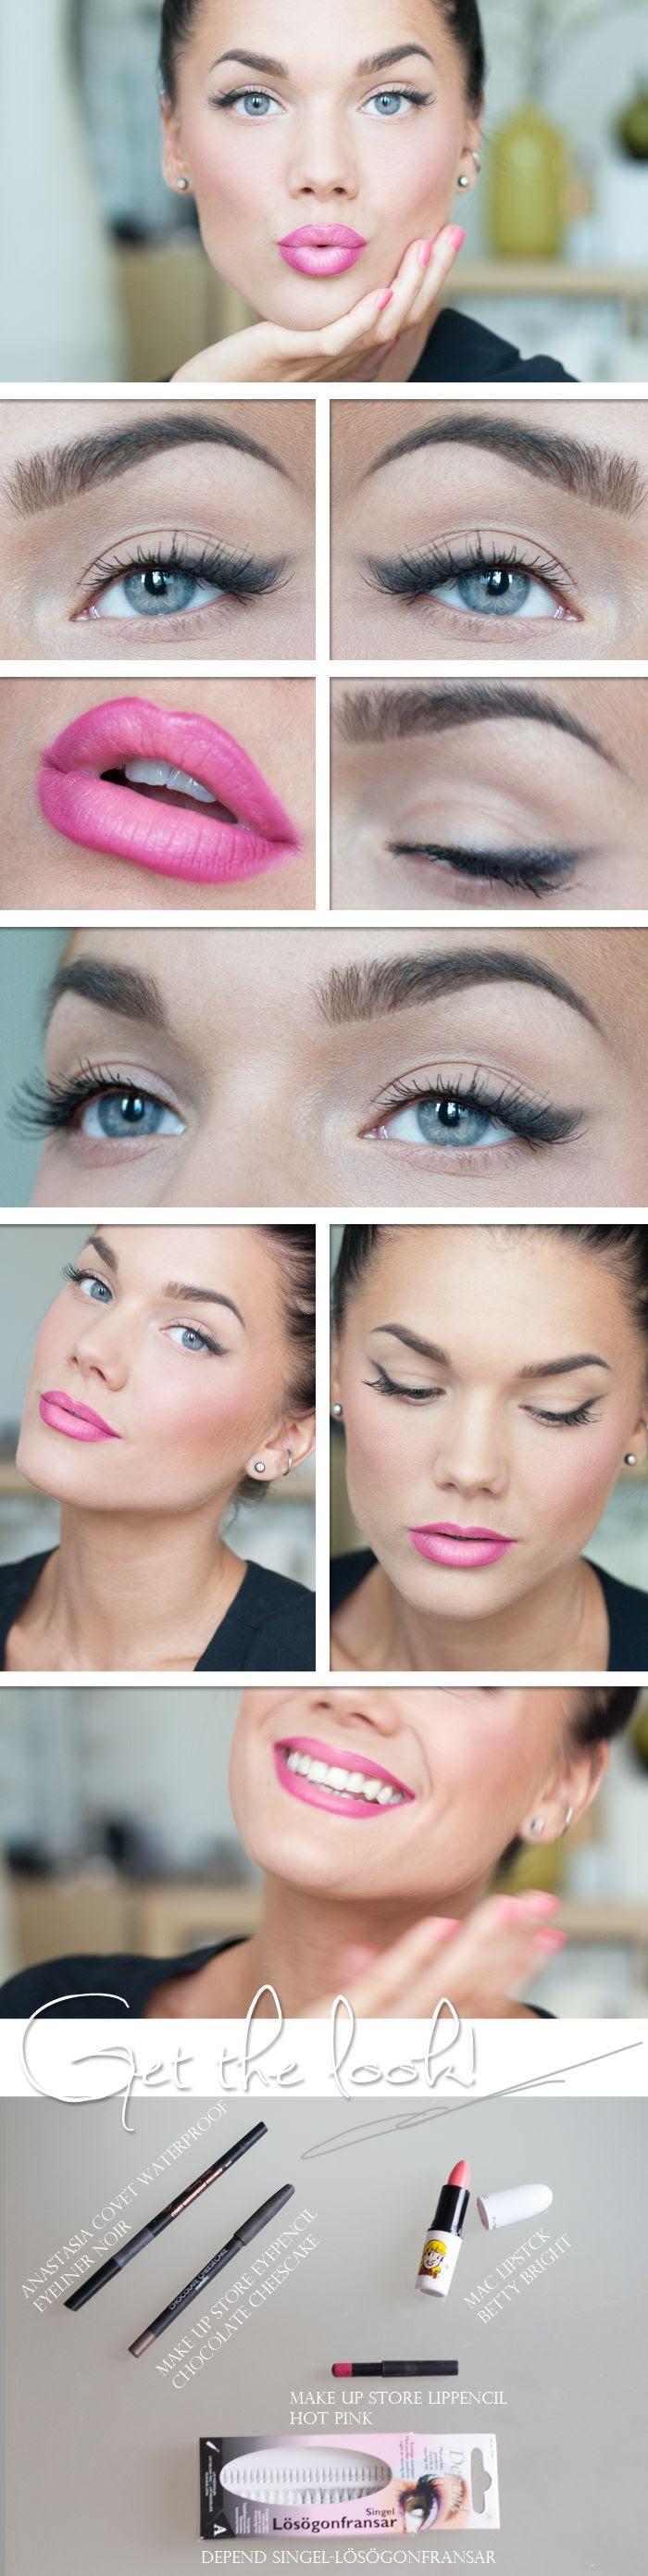 Focus on the lips - Linda Hallberg soft eye shadow